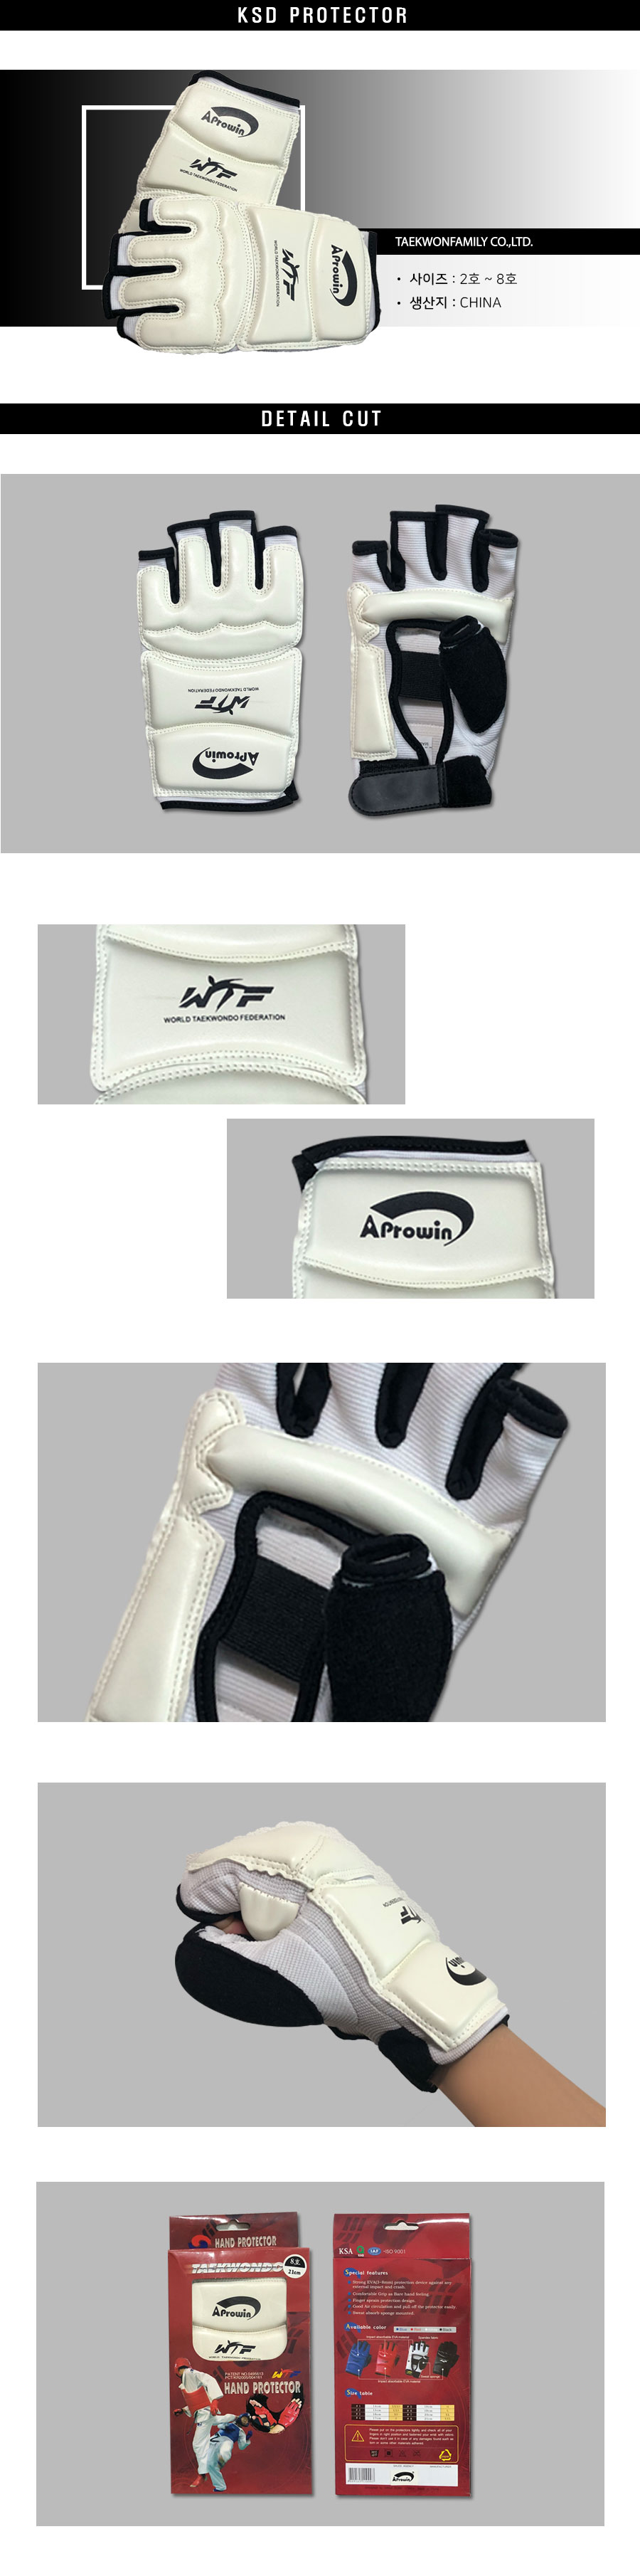 APROWIN Taekwondo Wrist Hands Protector Taekwondo Glove WTF 태권도 반장갑 손 보호대